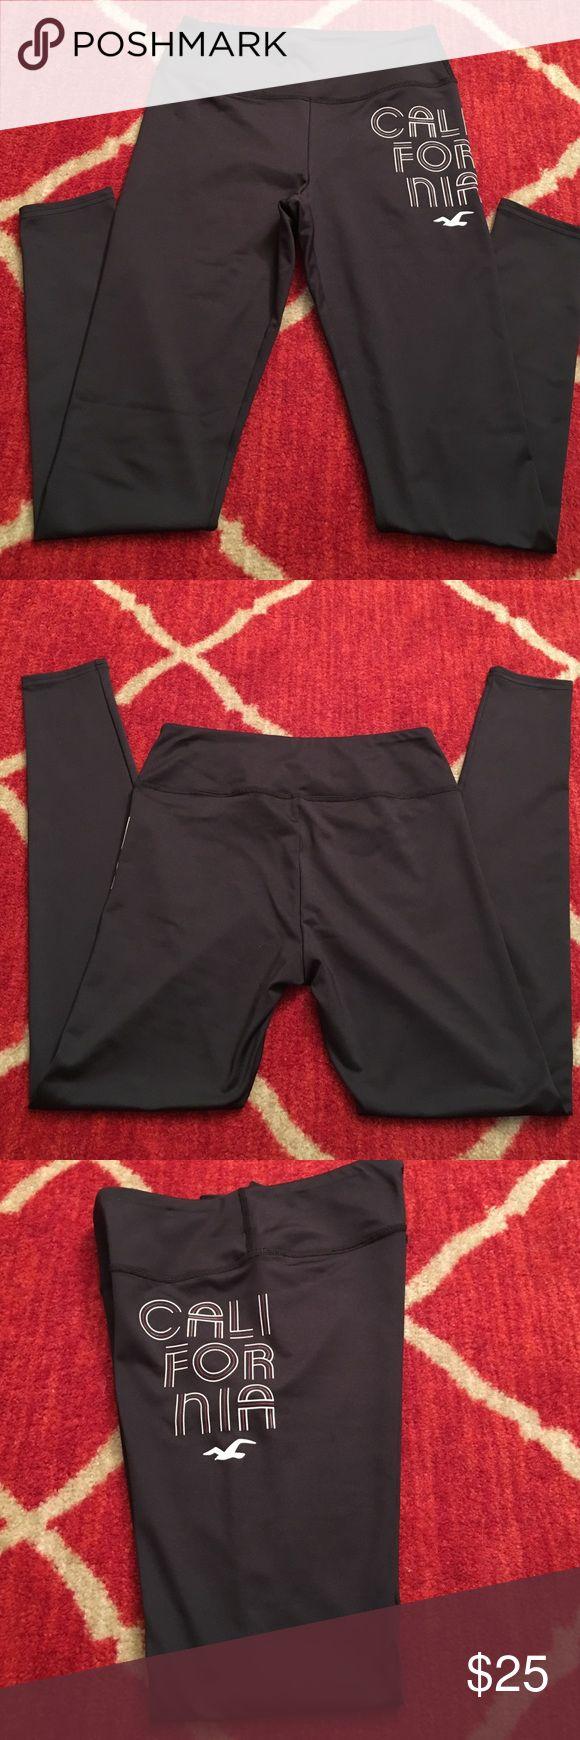 Hollister legging Hollister legging, worn once, like new. Comes from smoke free home! Hollister Pants Leggings